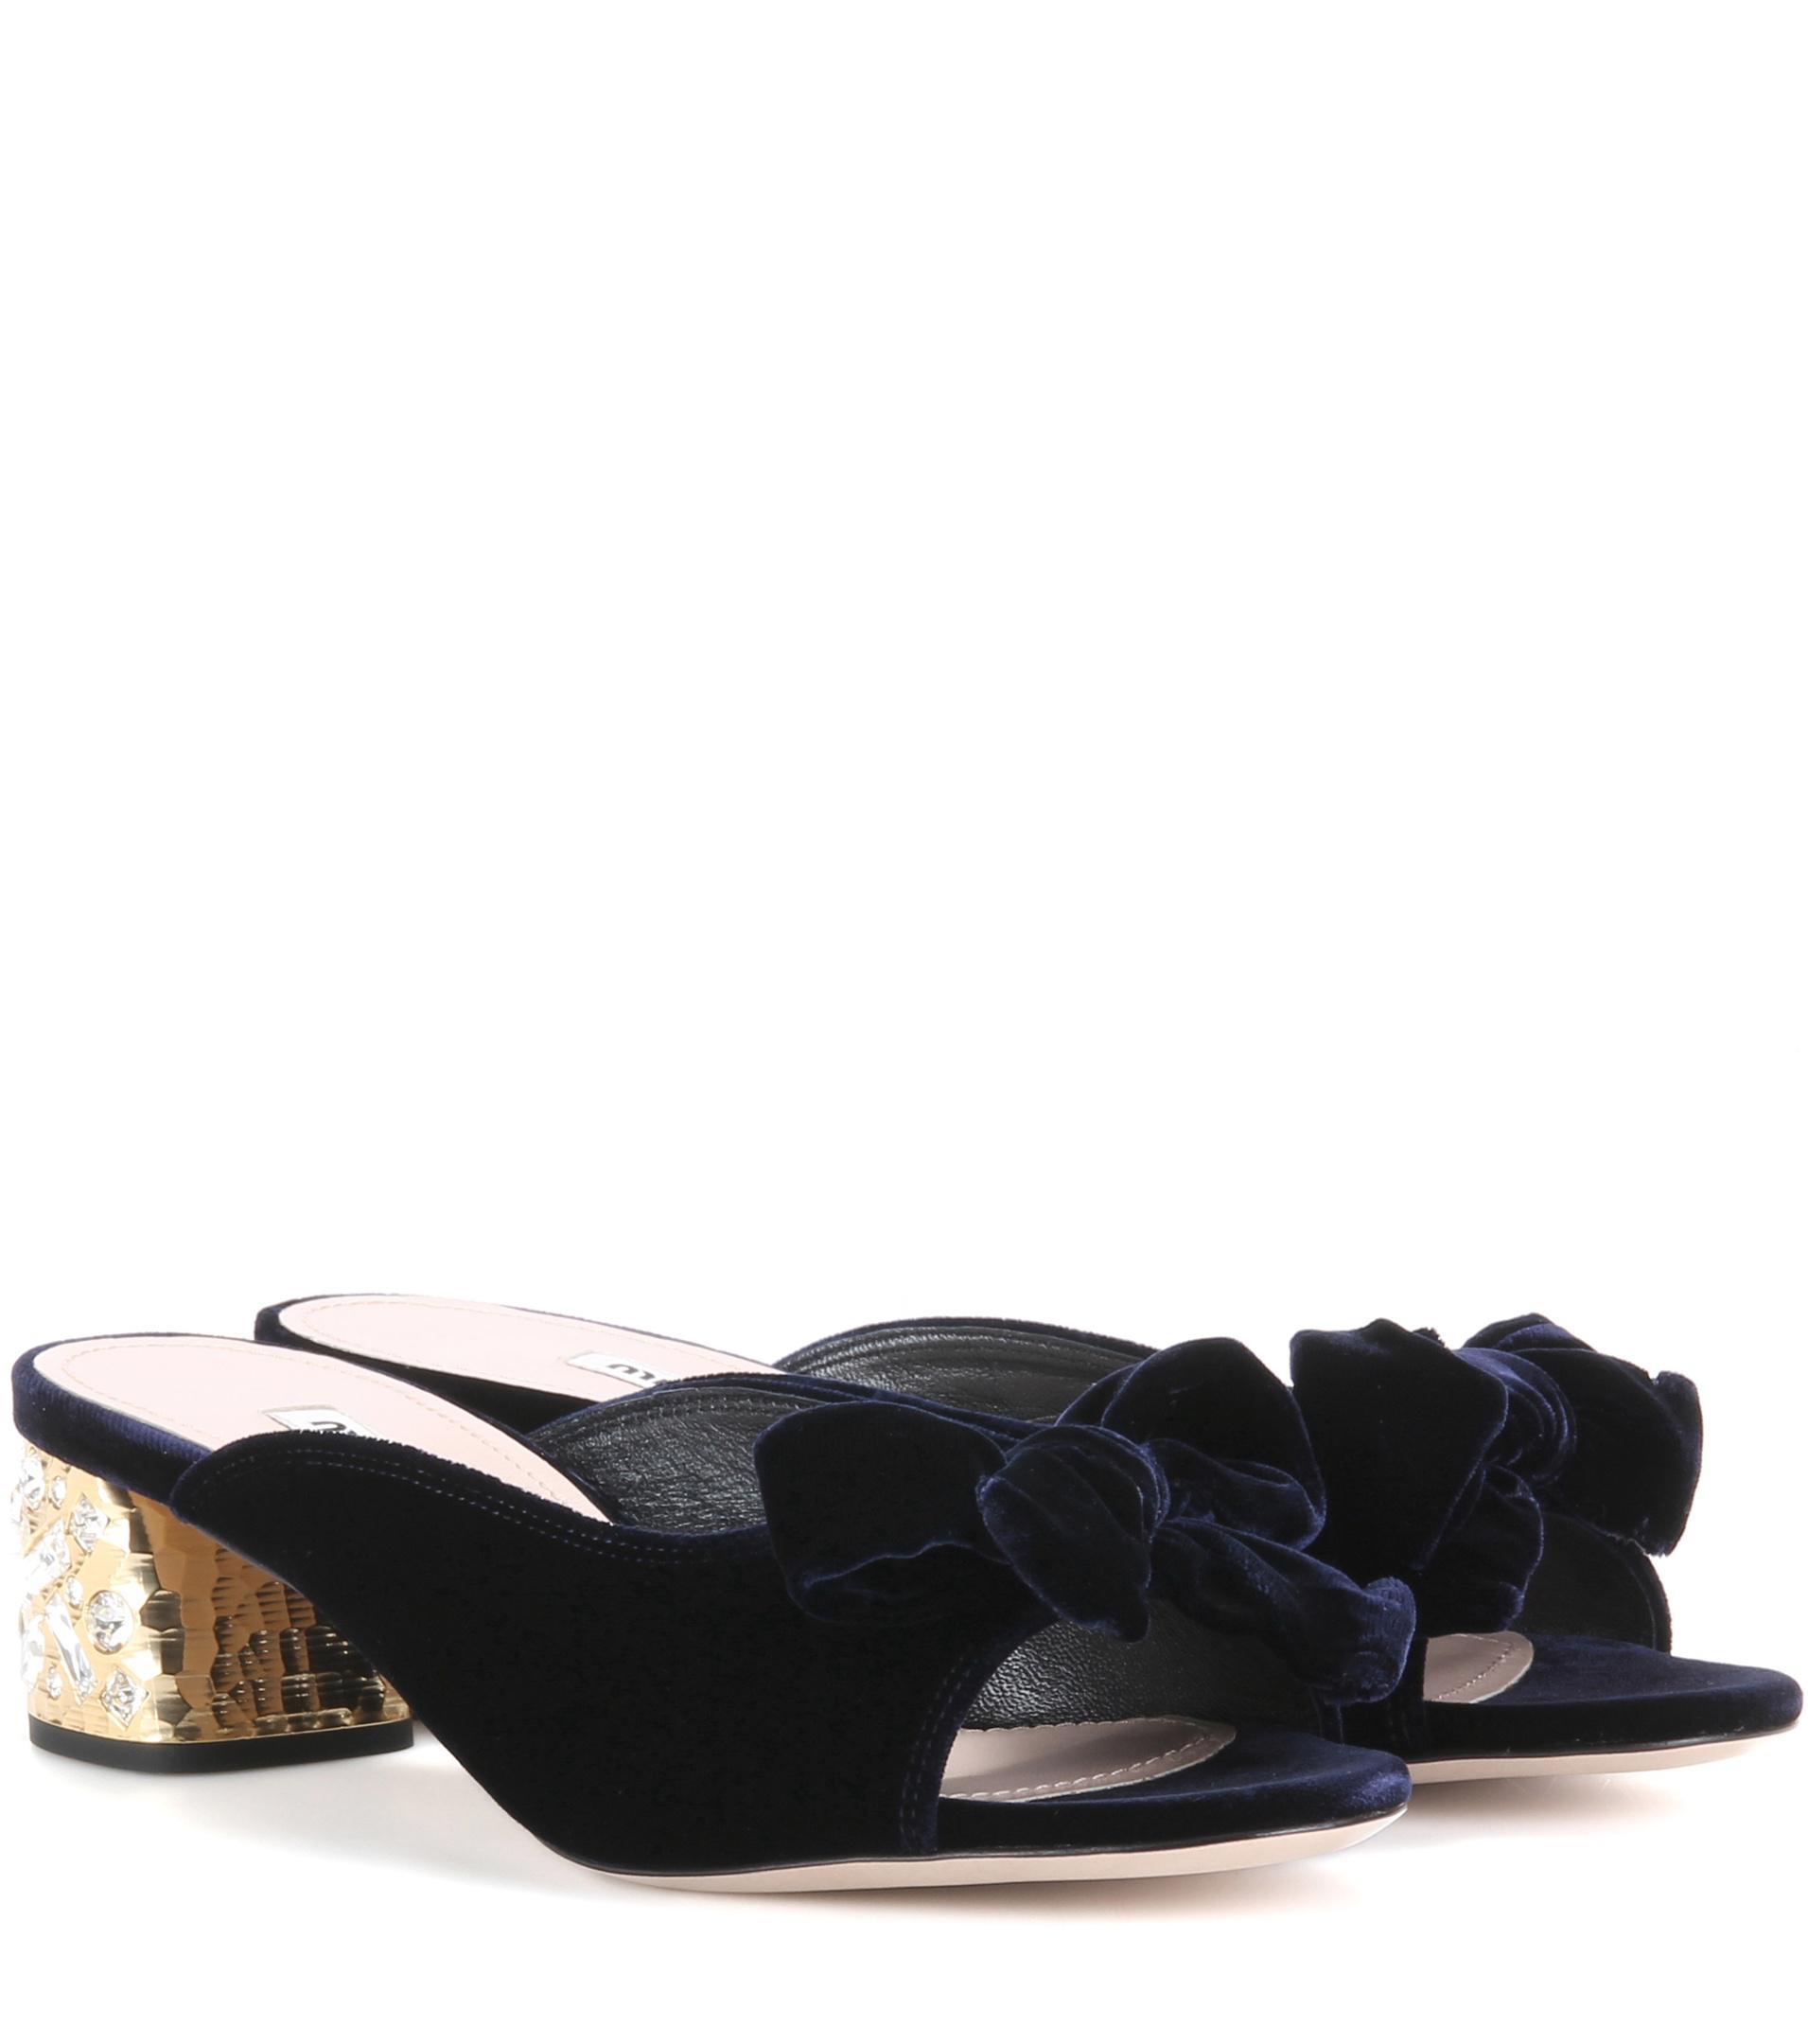 Miu Miu Embellished velvet sandals GFEJDeekf